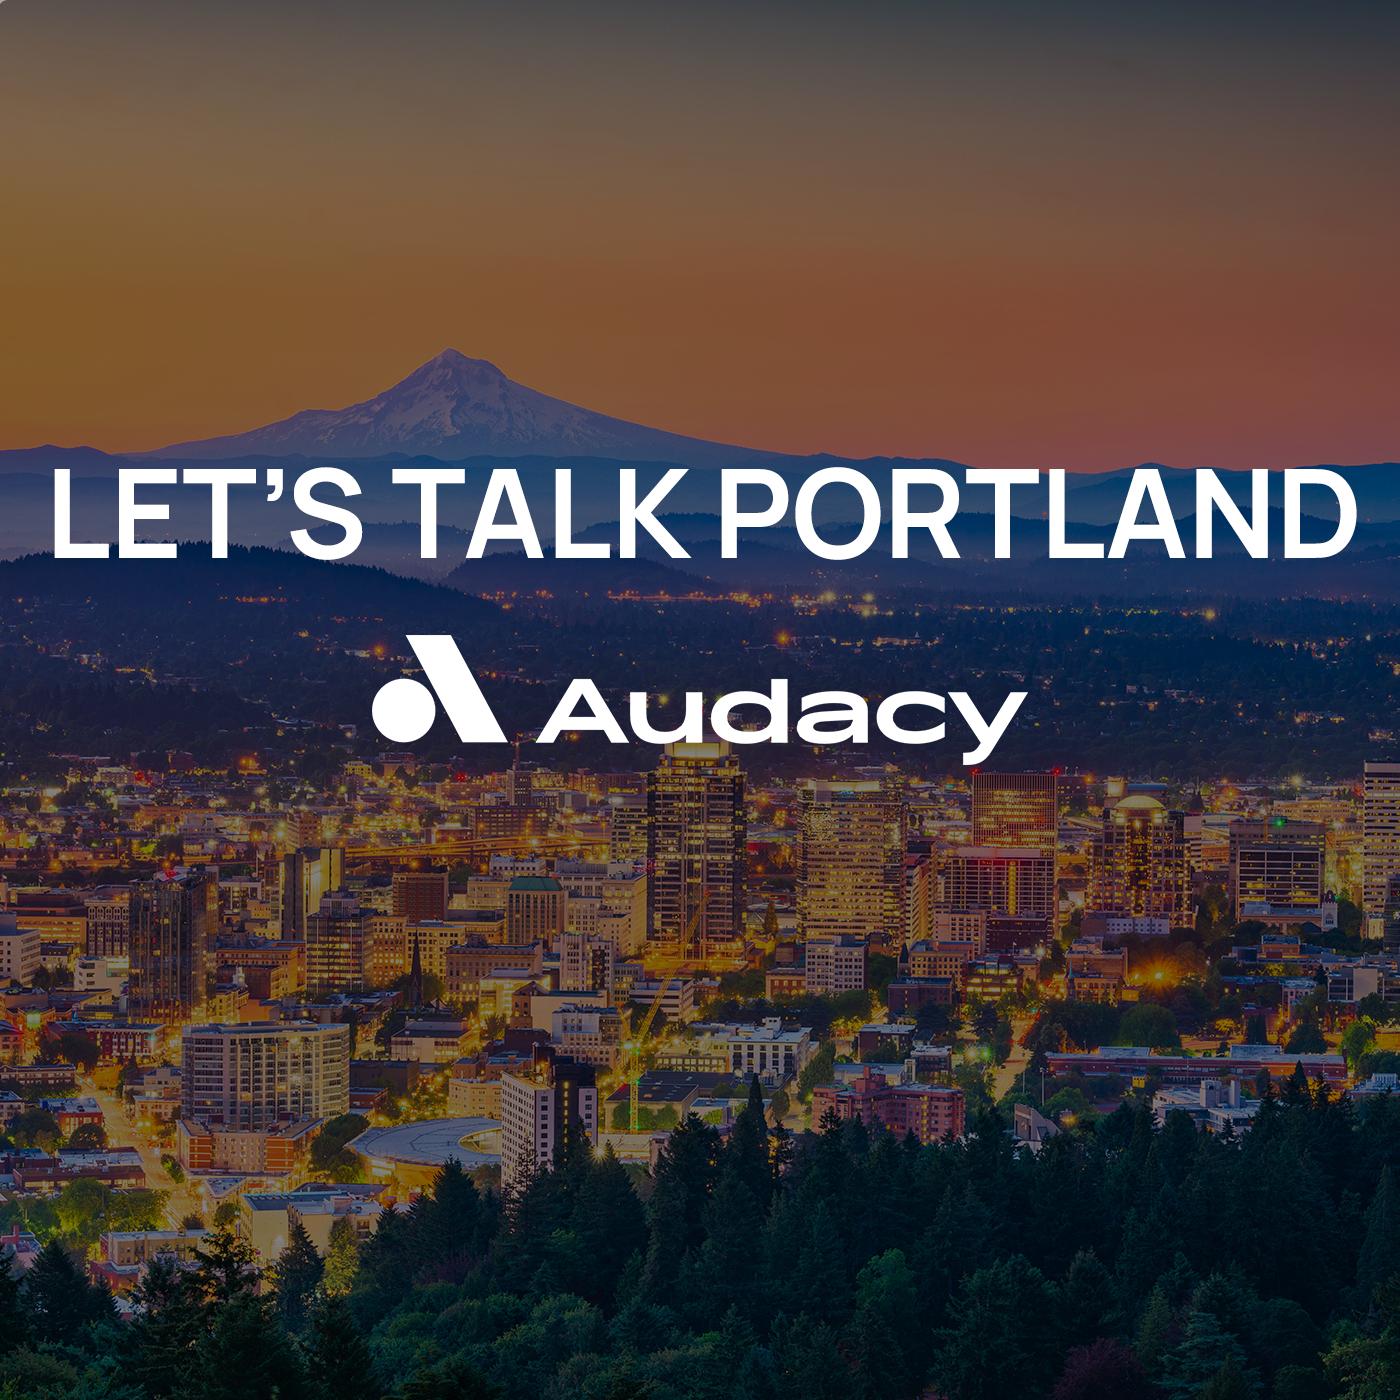 Let's Talk Portland